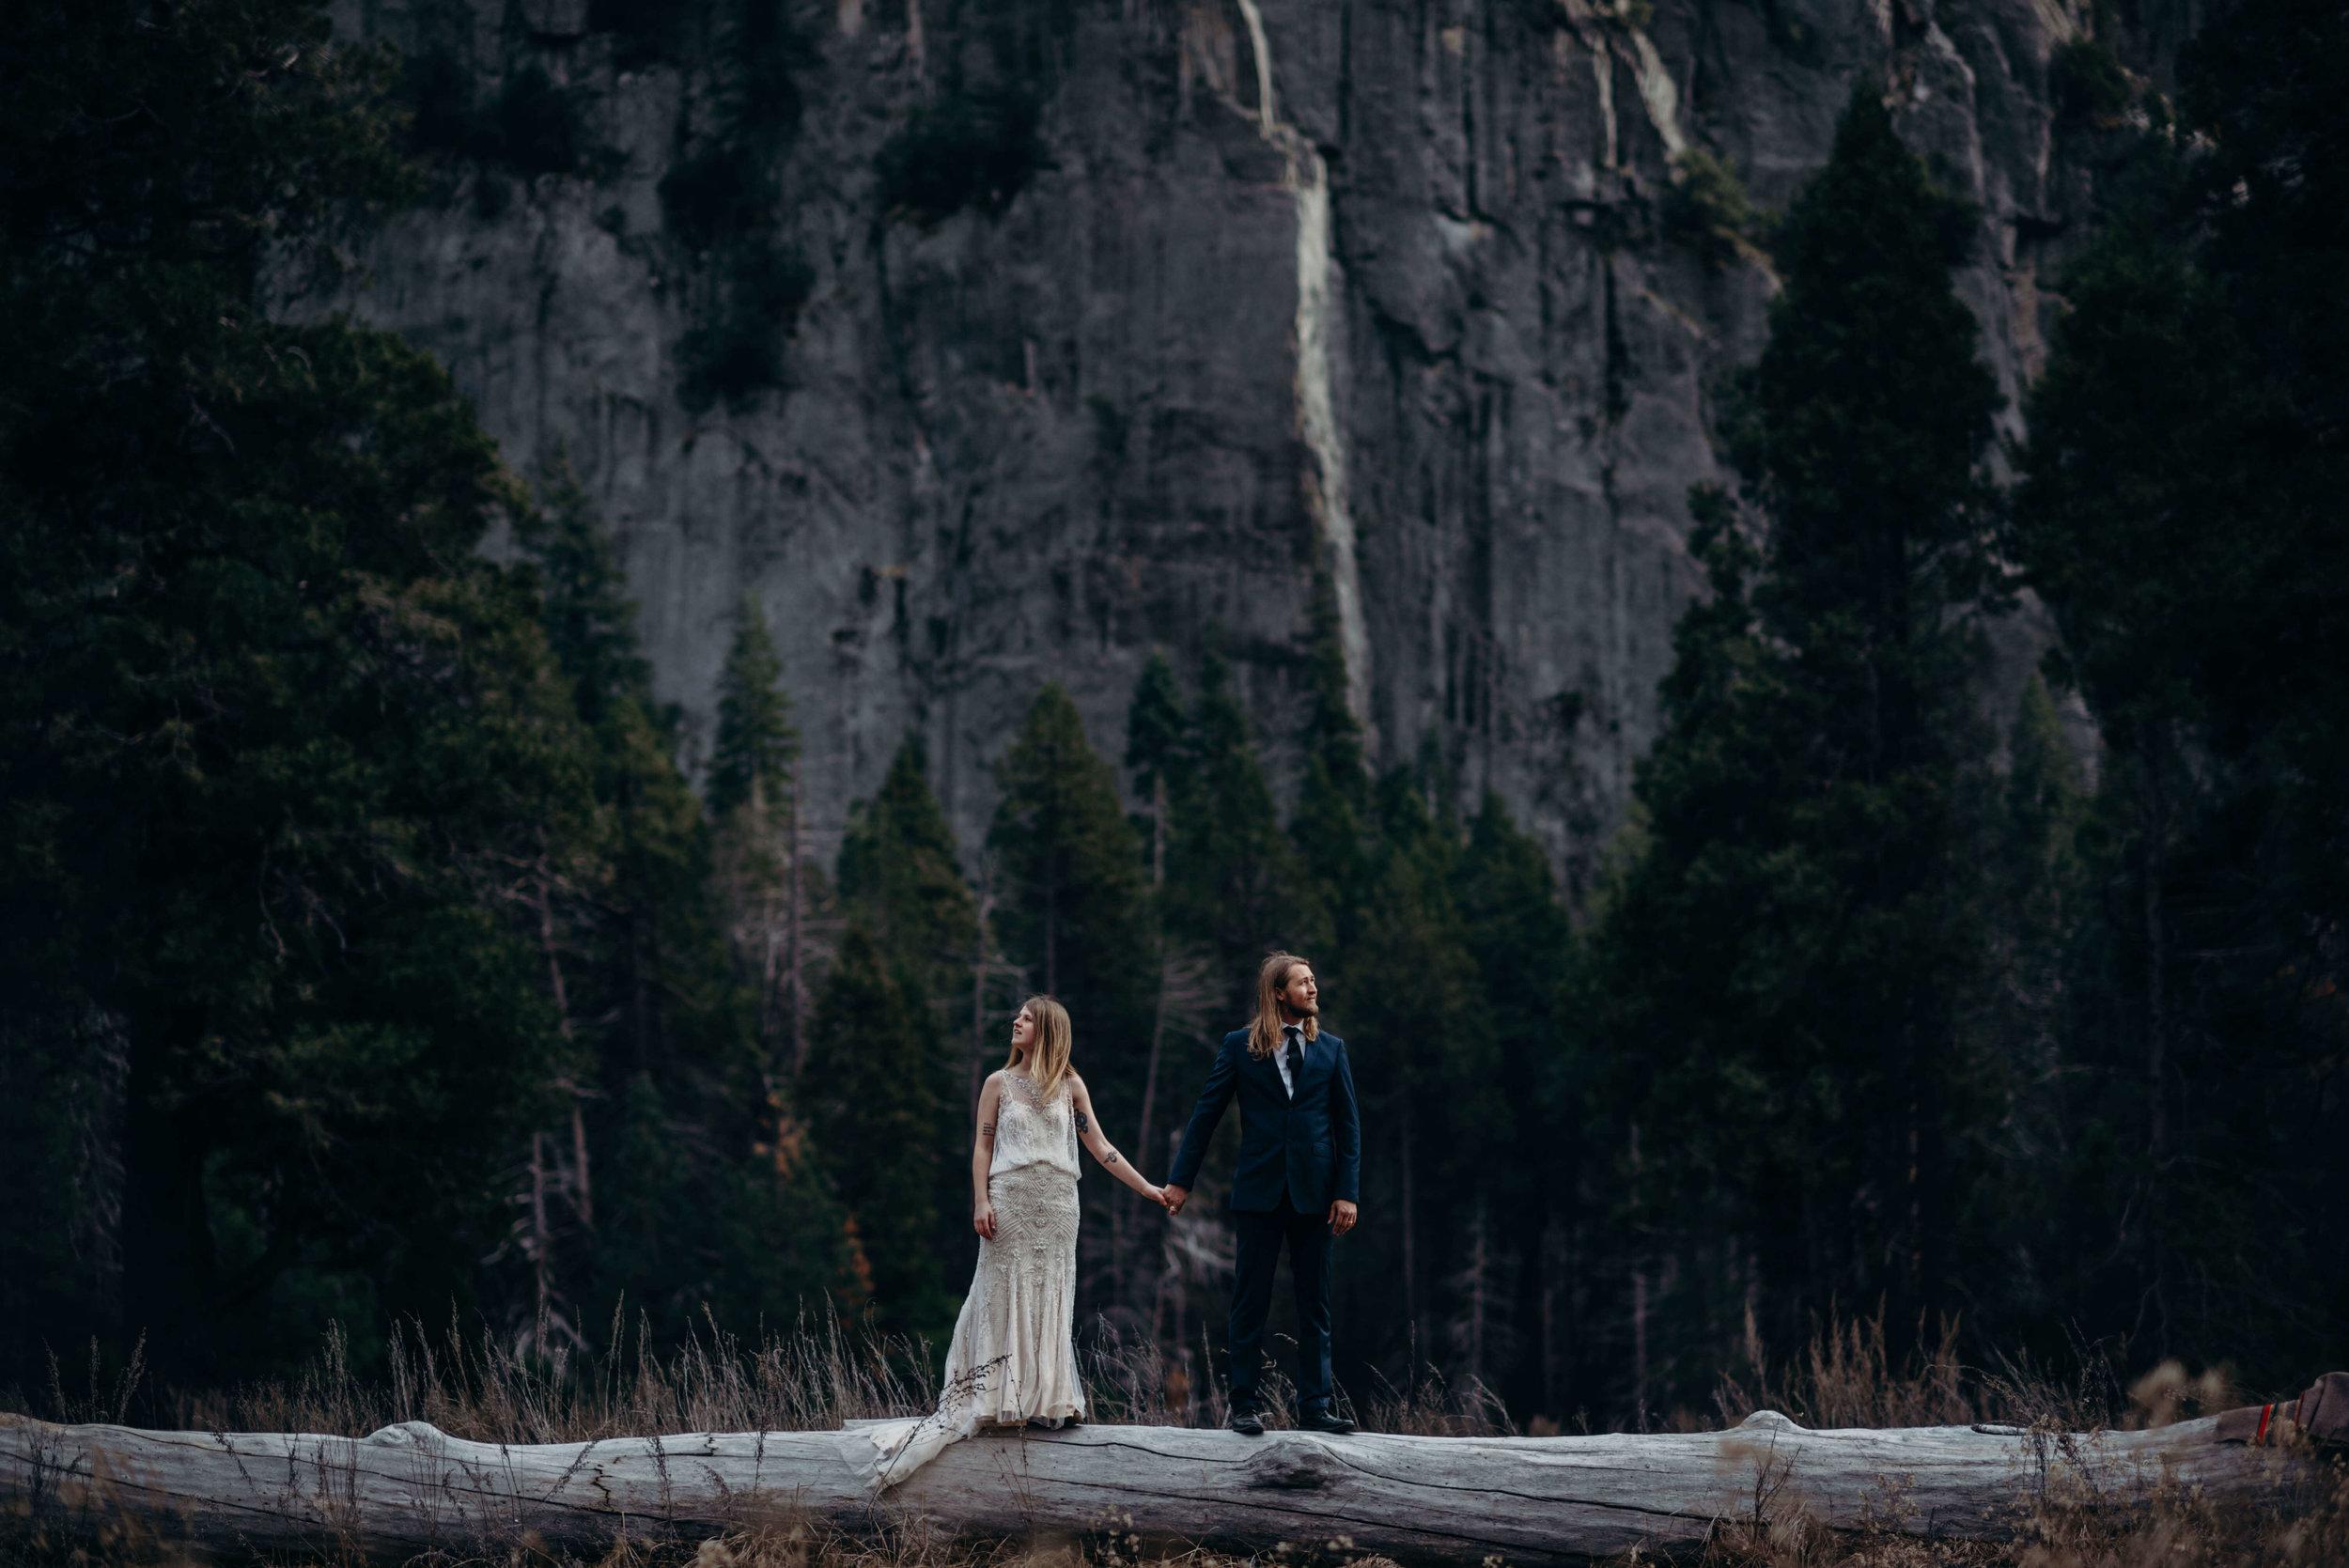 Adventure-Elopement-Yosemite-Valley-11.jpg